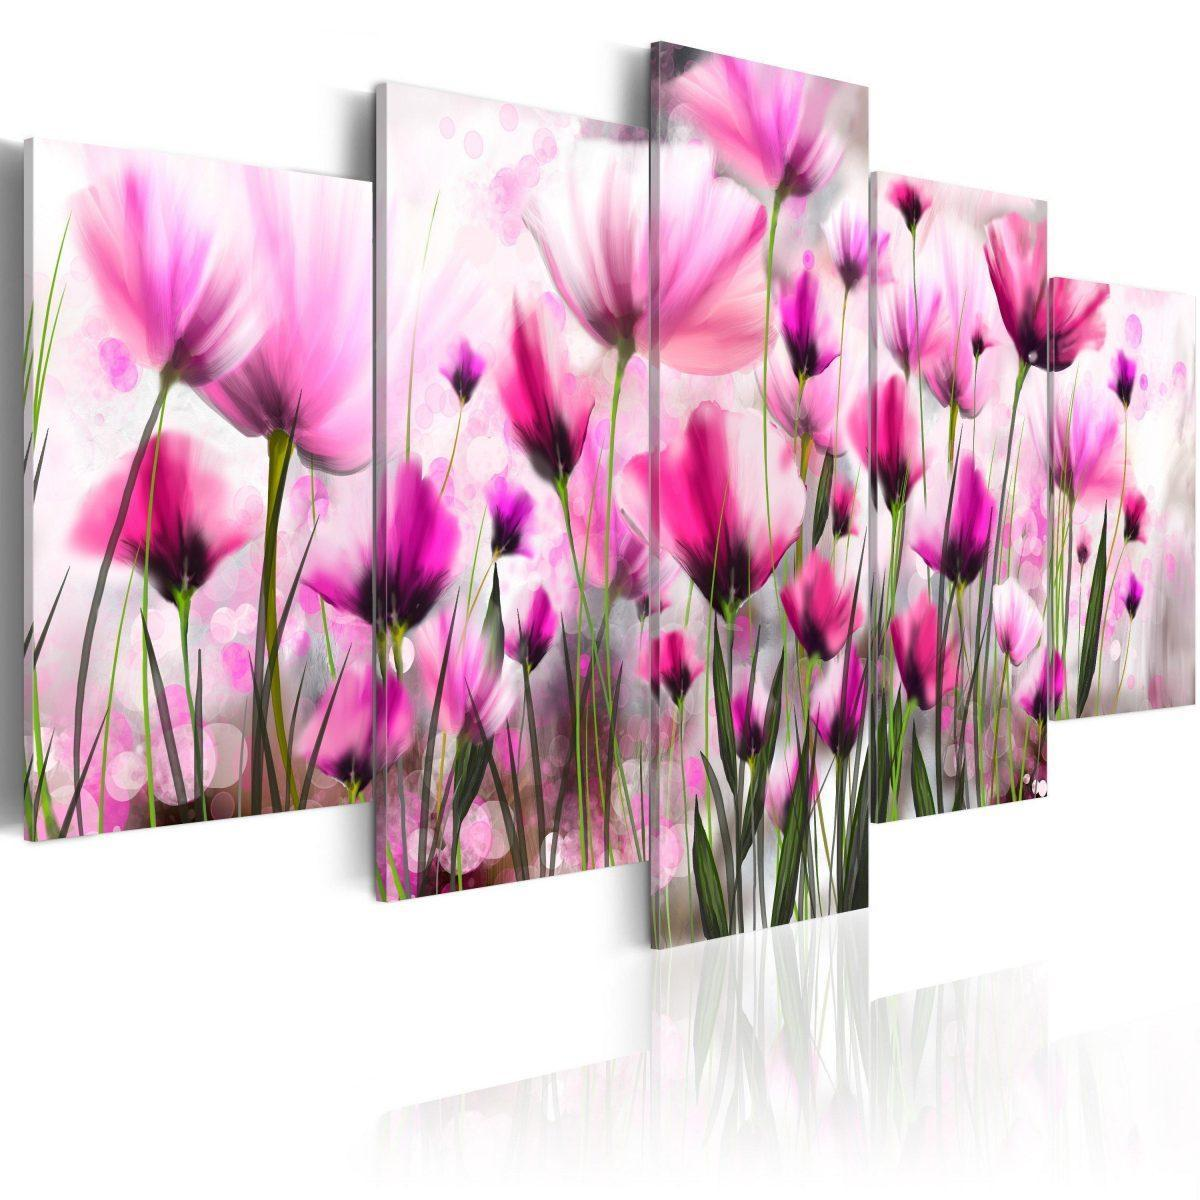 Canvas Tavla - The secret garden - 100x50